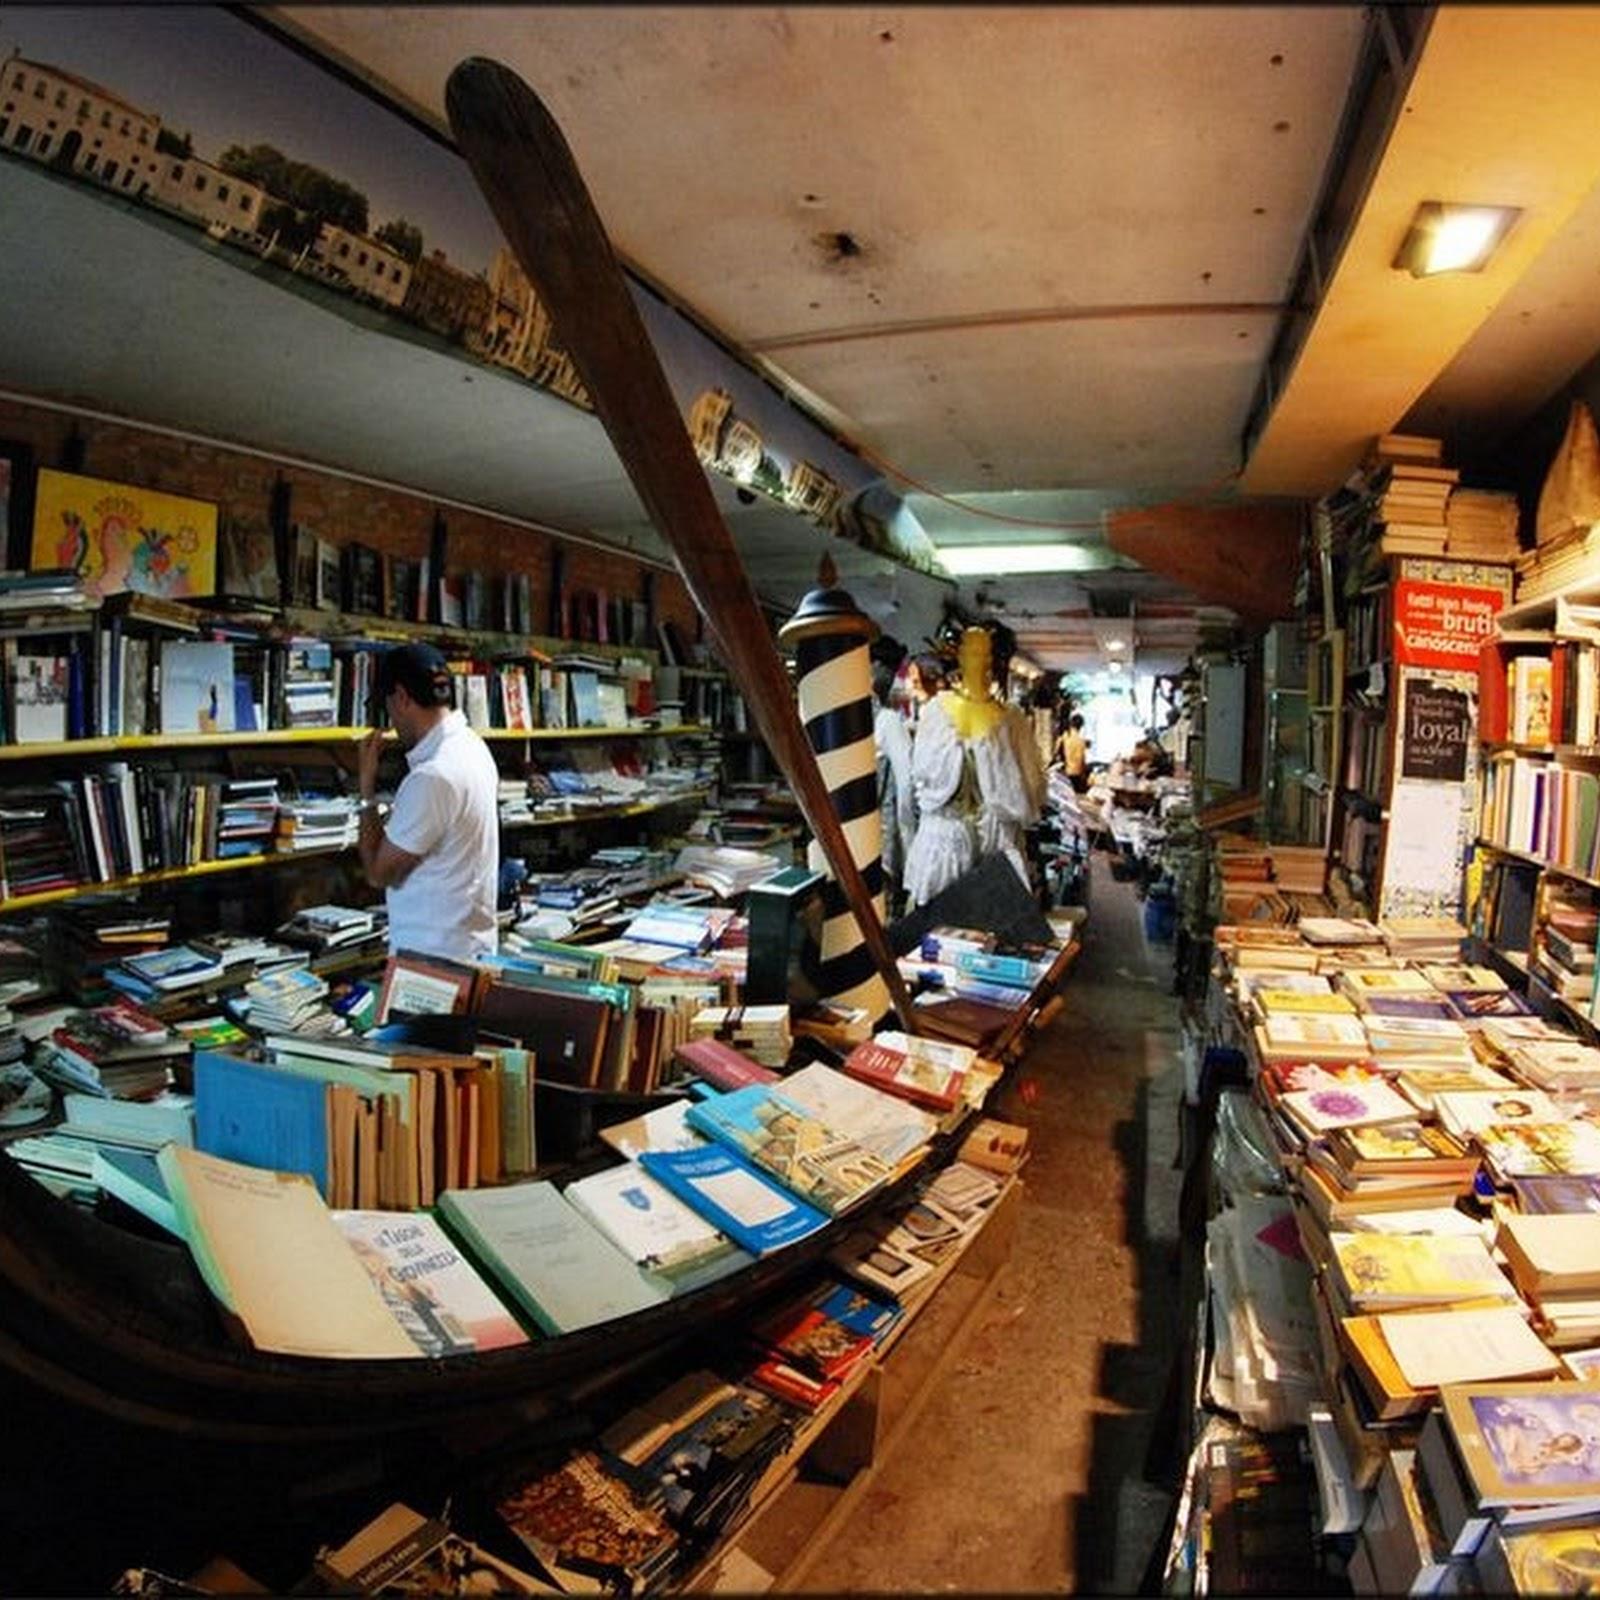 Libreria Acqua Alta, Venice's Flooded Bookstore